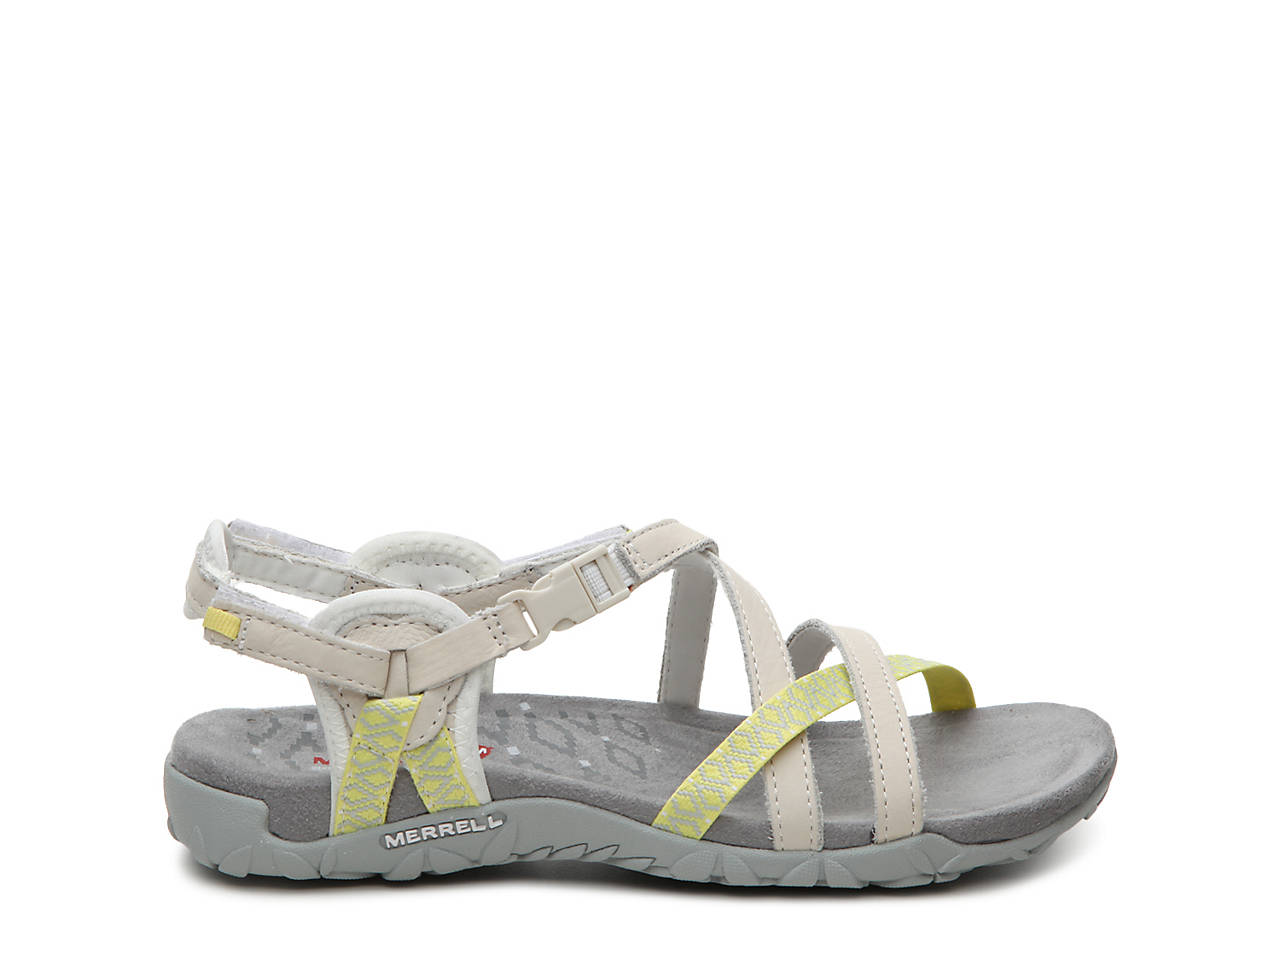 908ef2c5539c Merrell Terran Lattice II Sport Sandal Women s Shoes